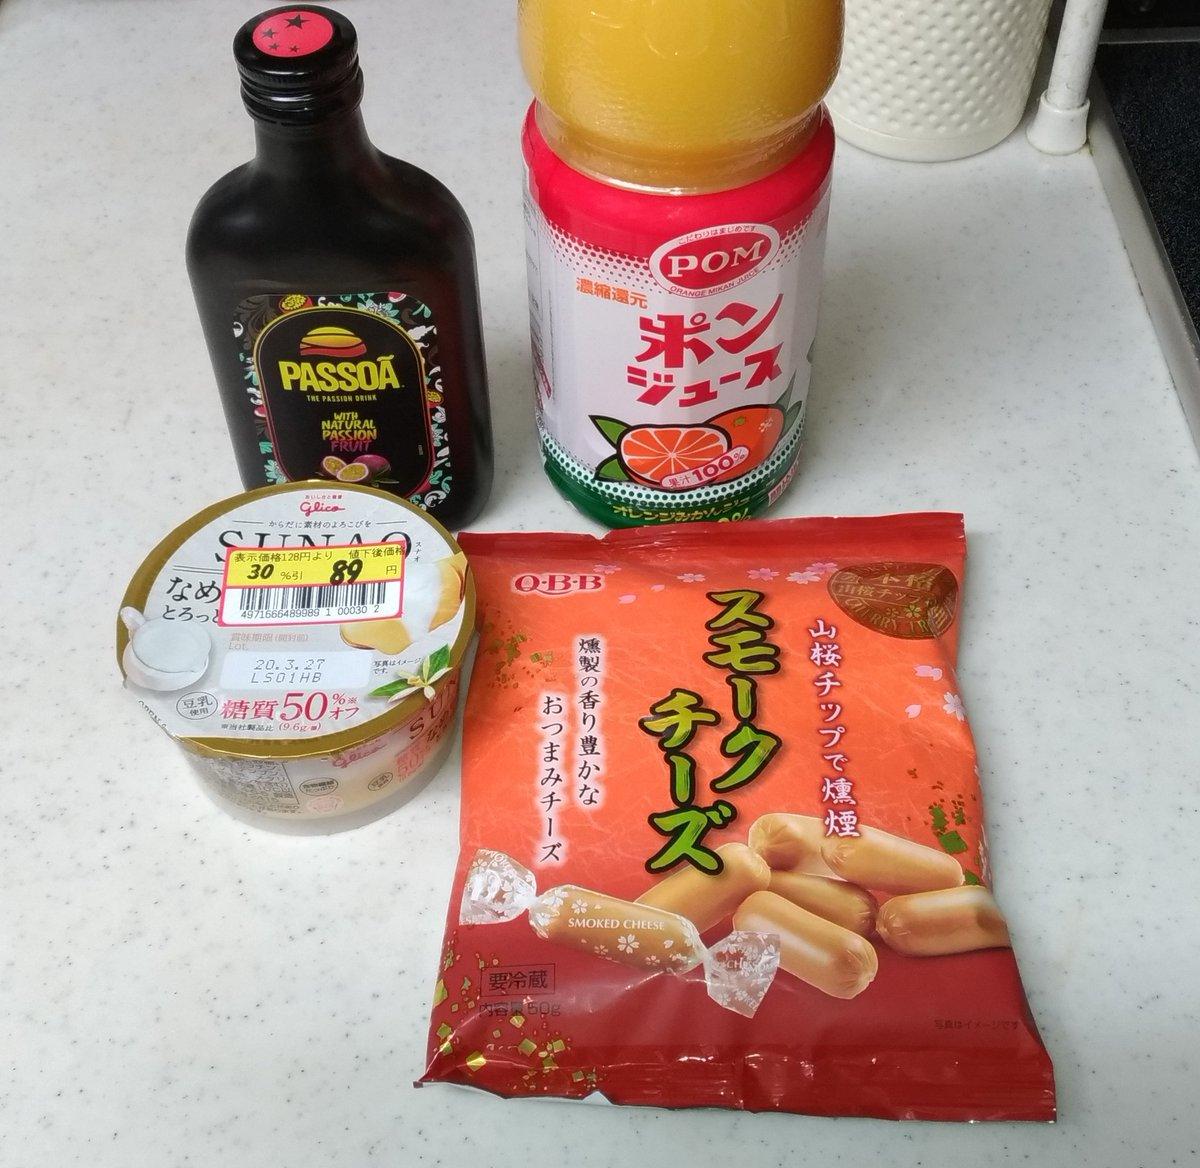 test ツイッターメディア - 超速GPへの徳井青空さん登場祝いに!⊂(^ω^)⊃🥥🍊🍮🧀 https://t.co/CHPmBrB4fZ